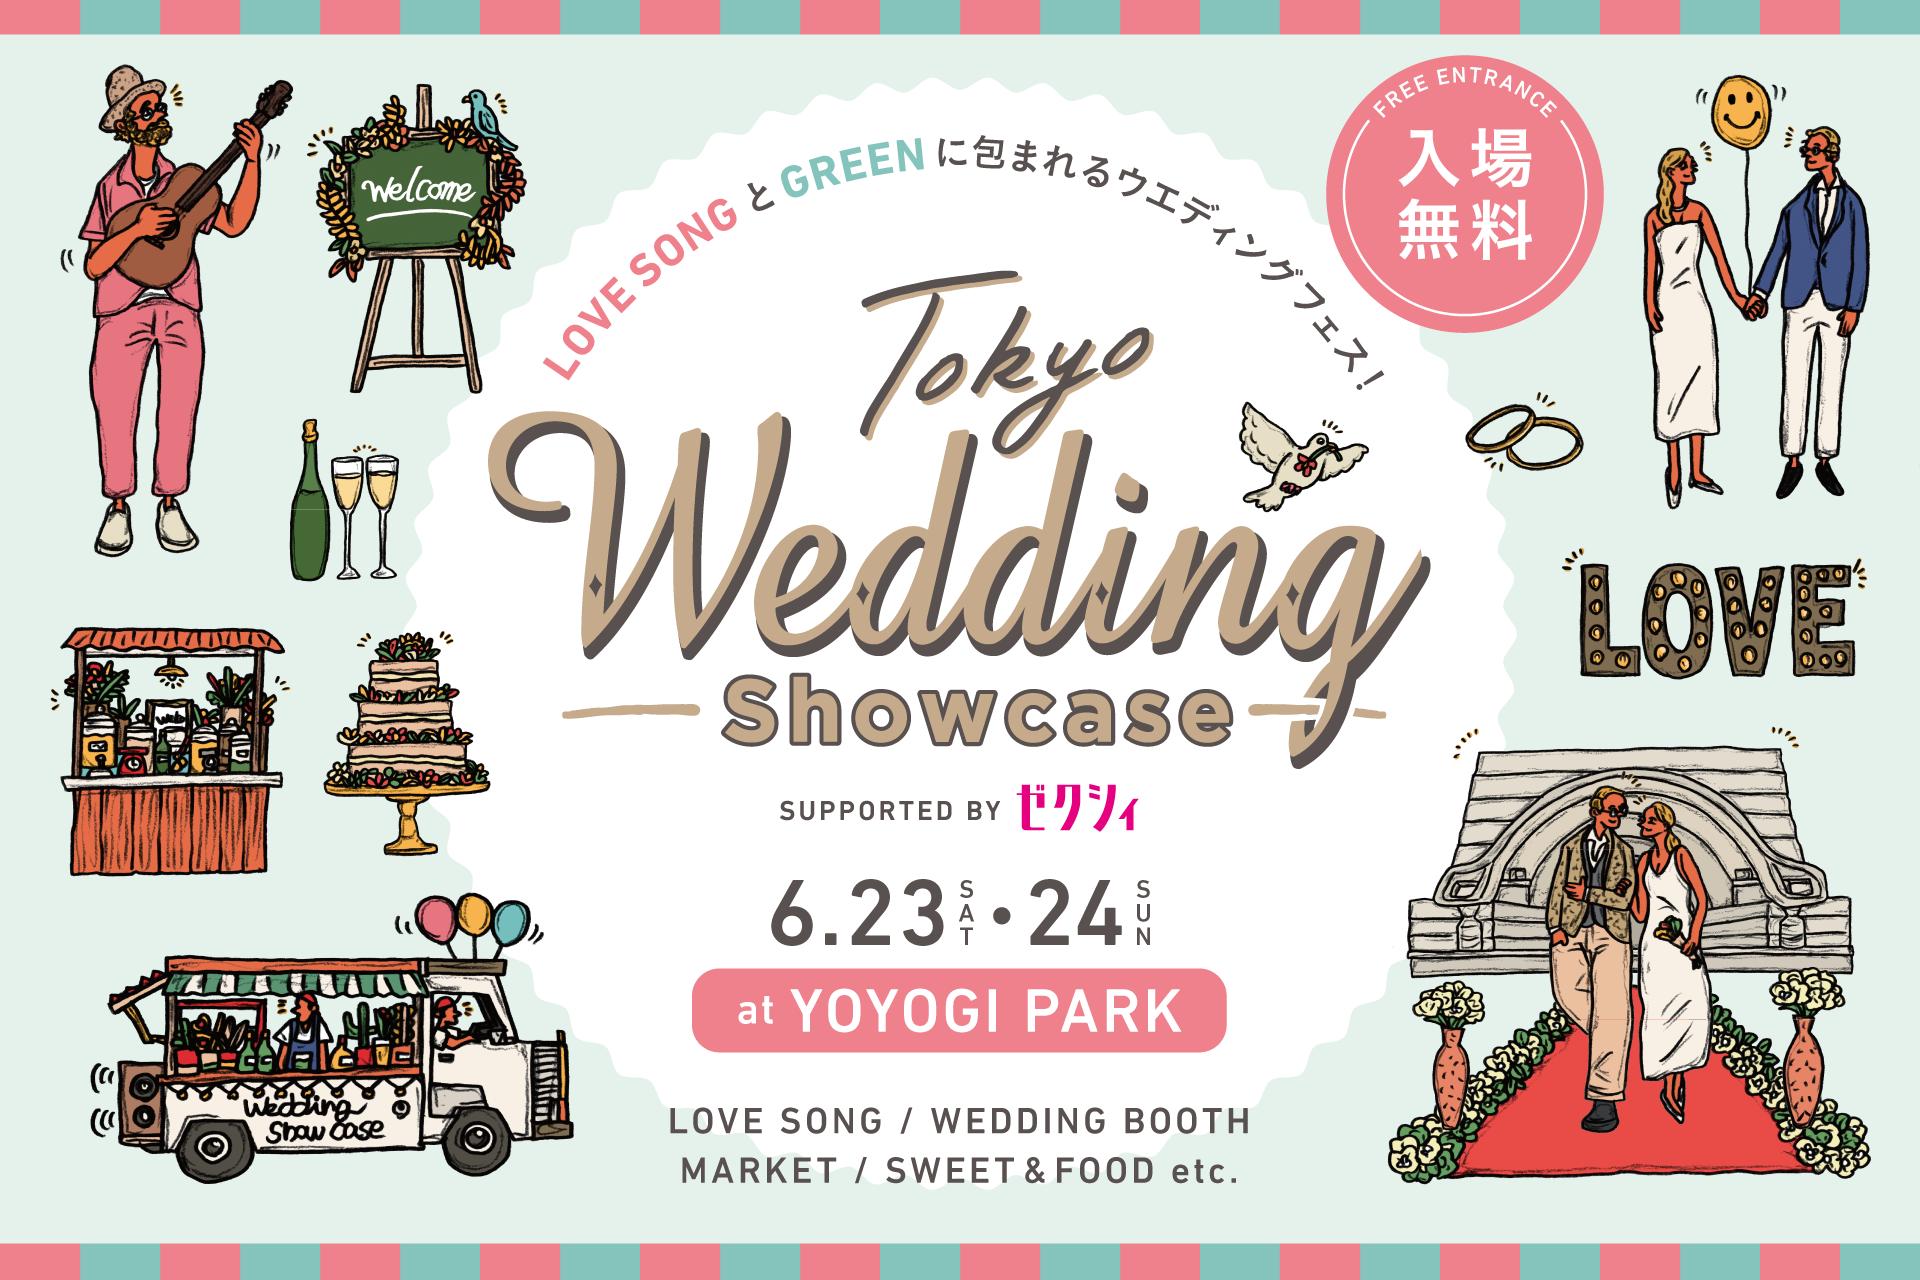 TOKYO WEDDING SHOWCASE